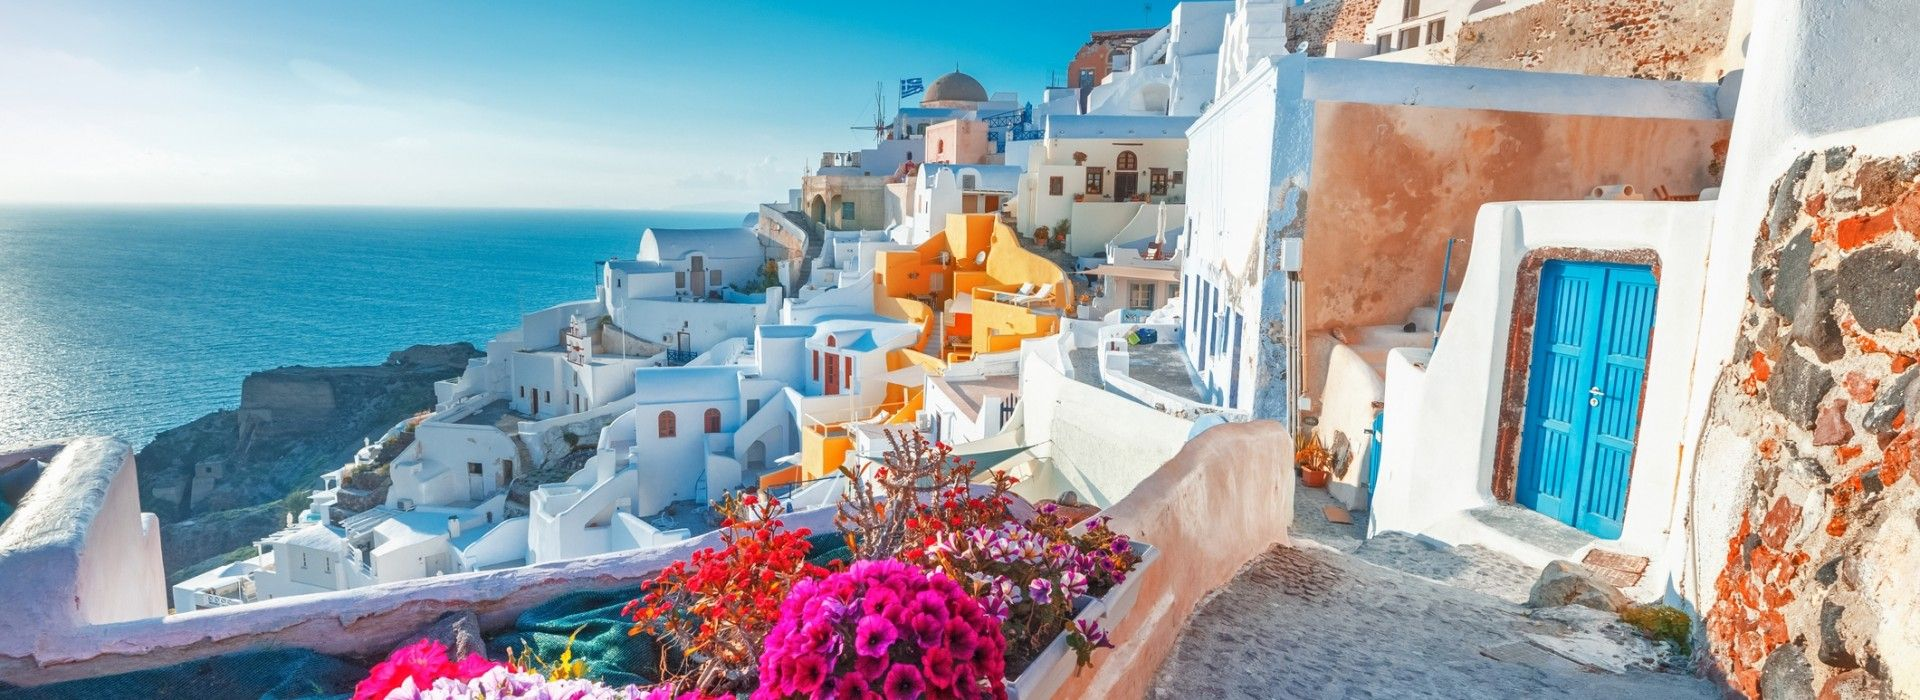 Expedition tours in Mediterranean